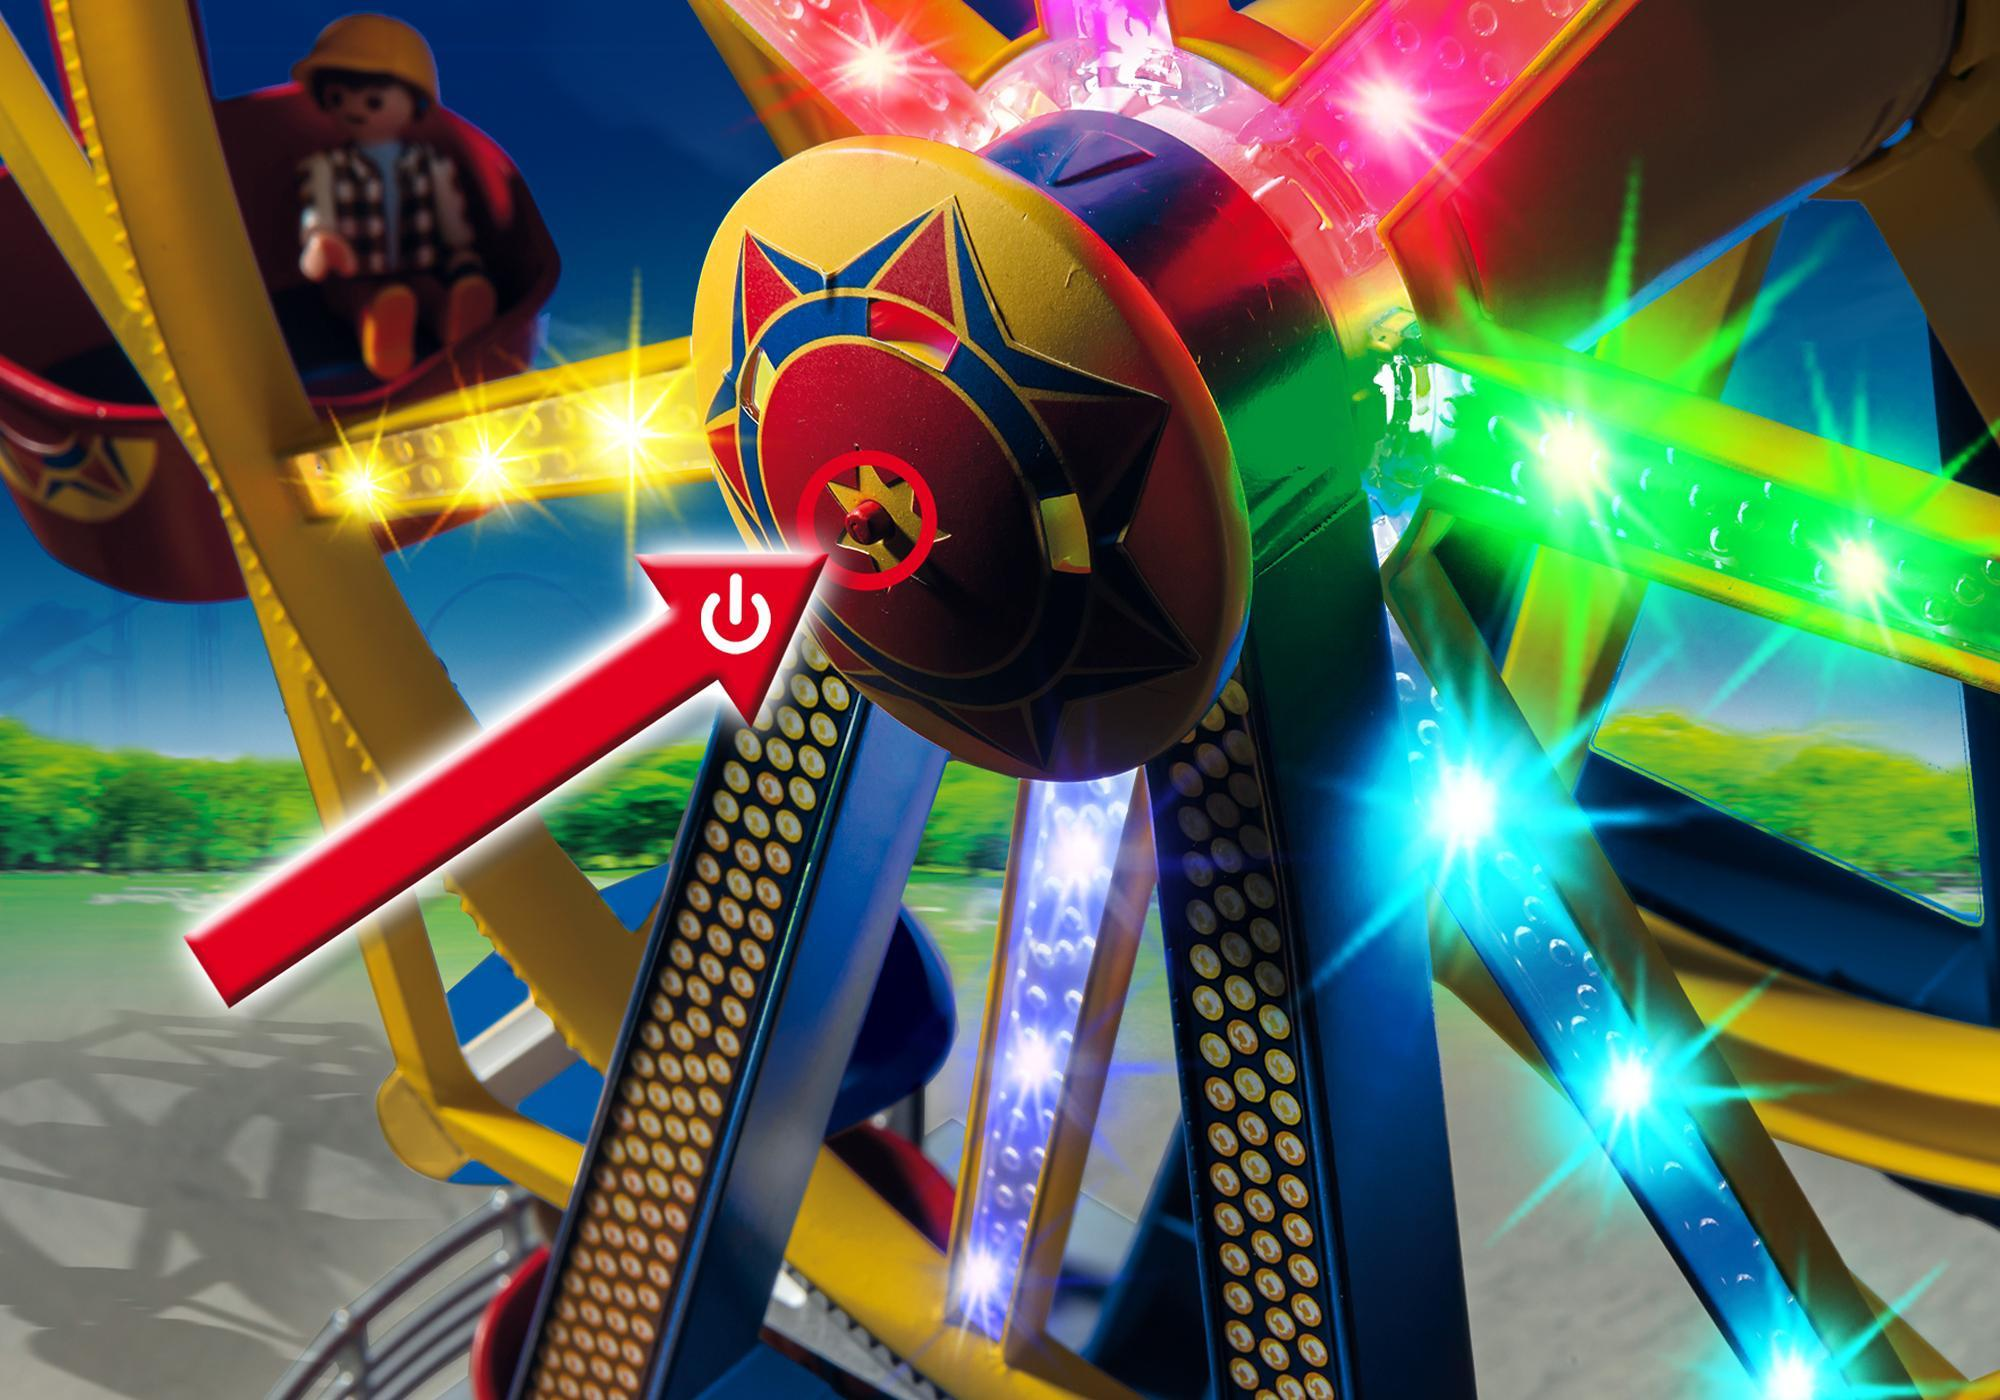 http://media.playmobil.com/i/playmobil/5552_product_extra1/Ferris Wheel with Lights